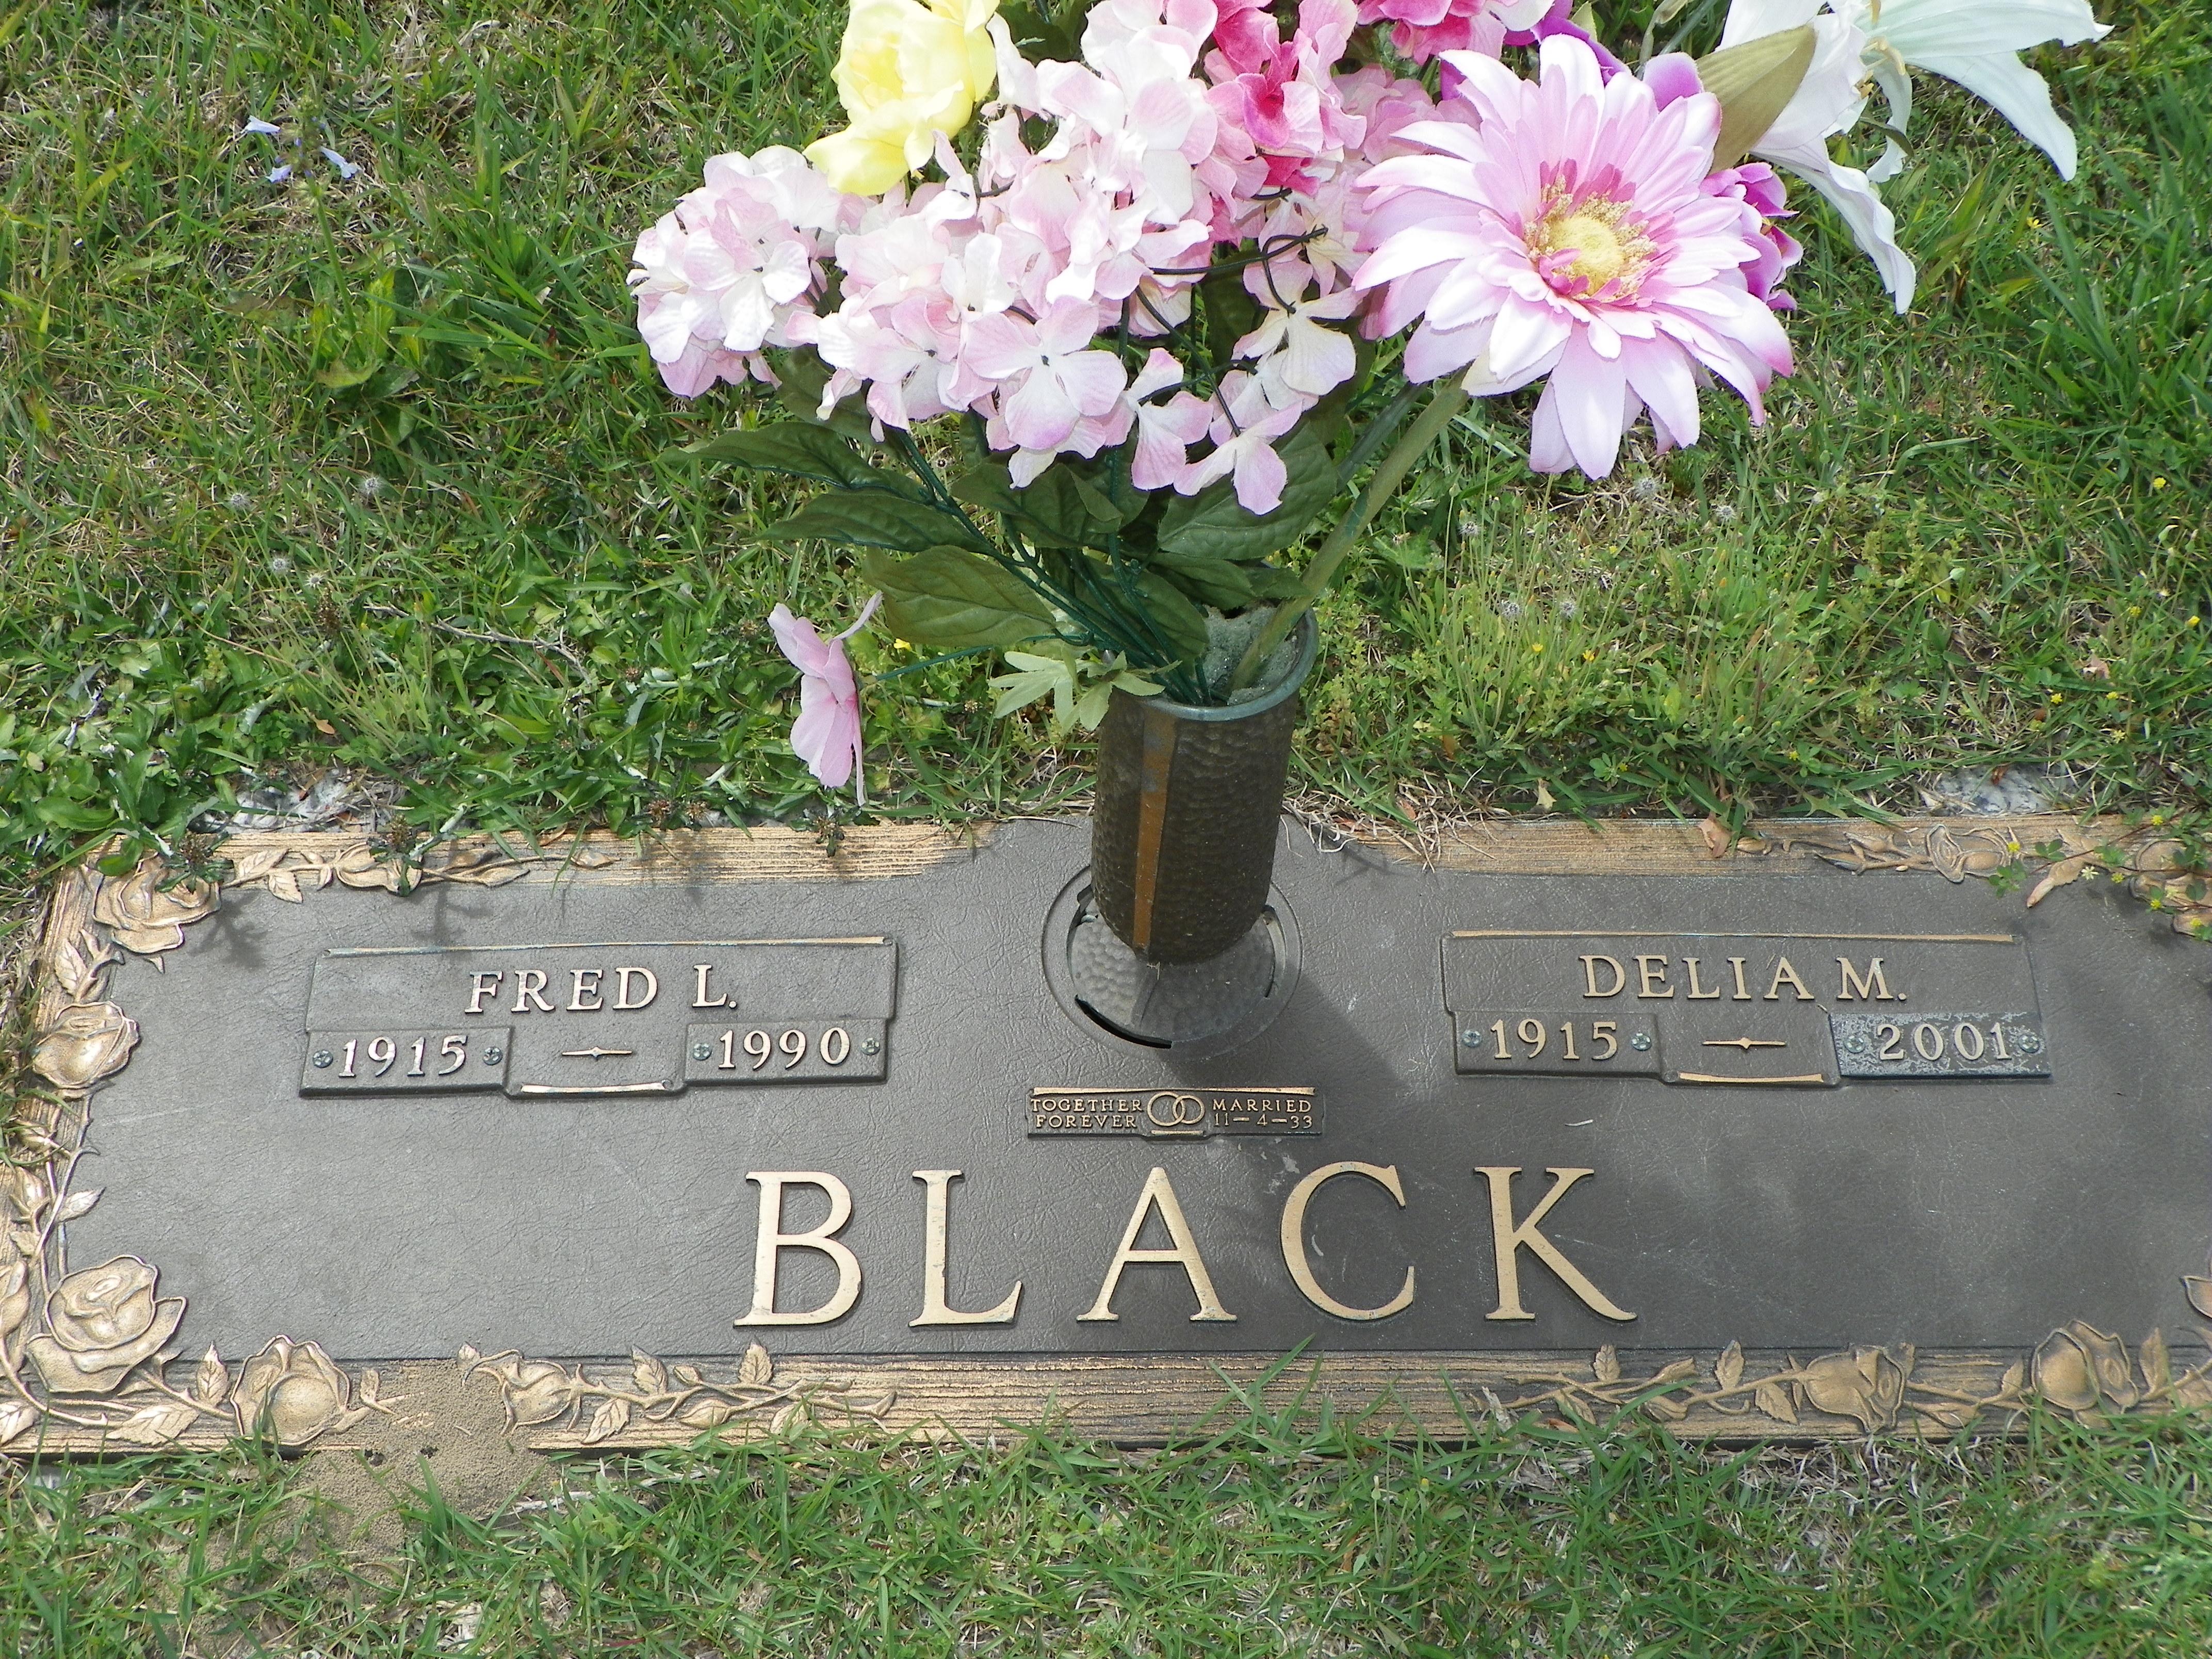 Fred L. Black